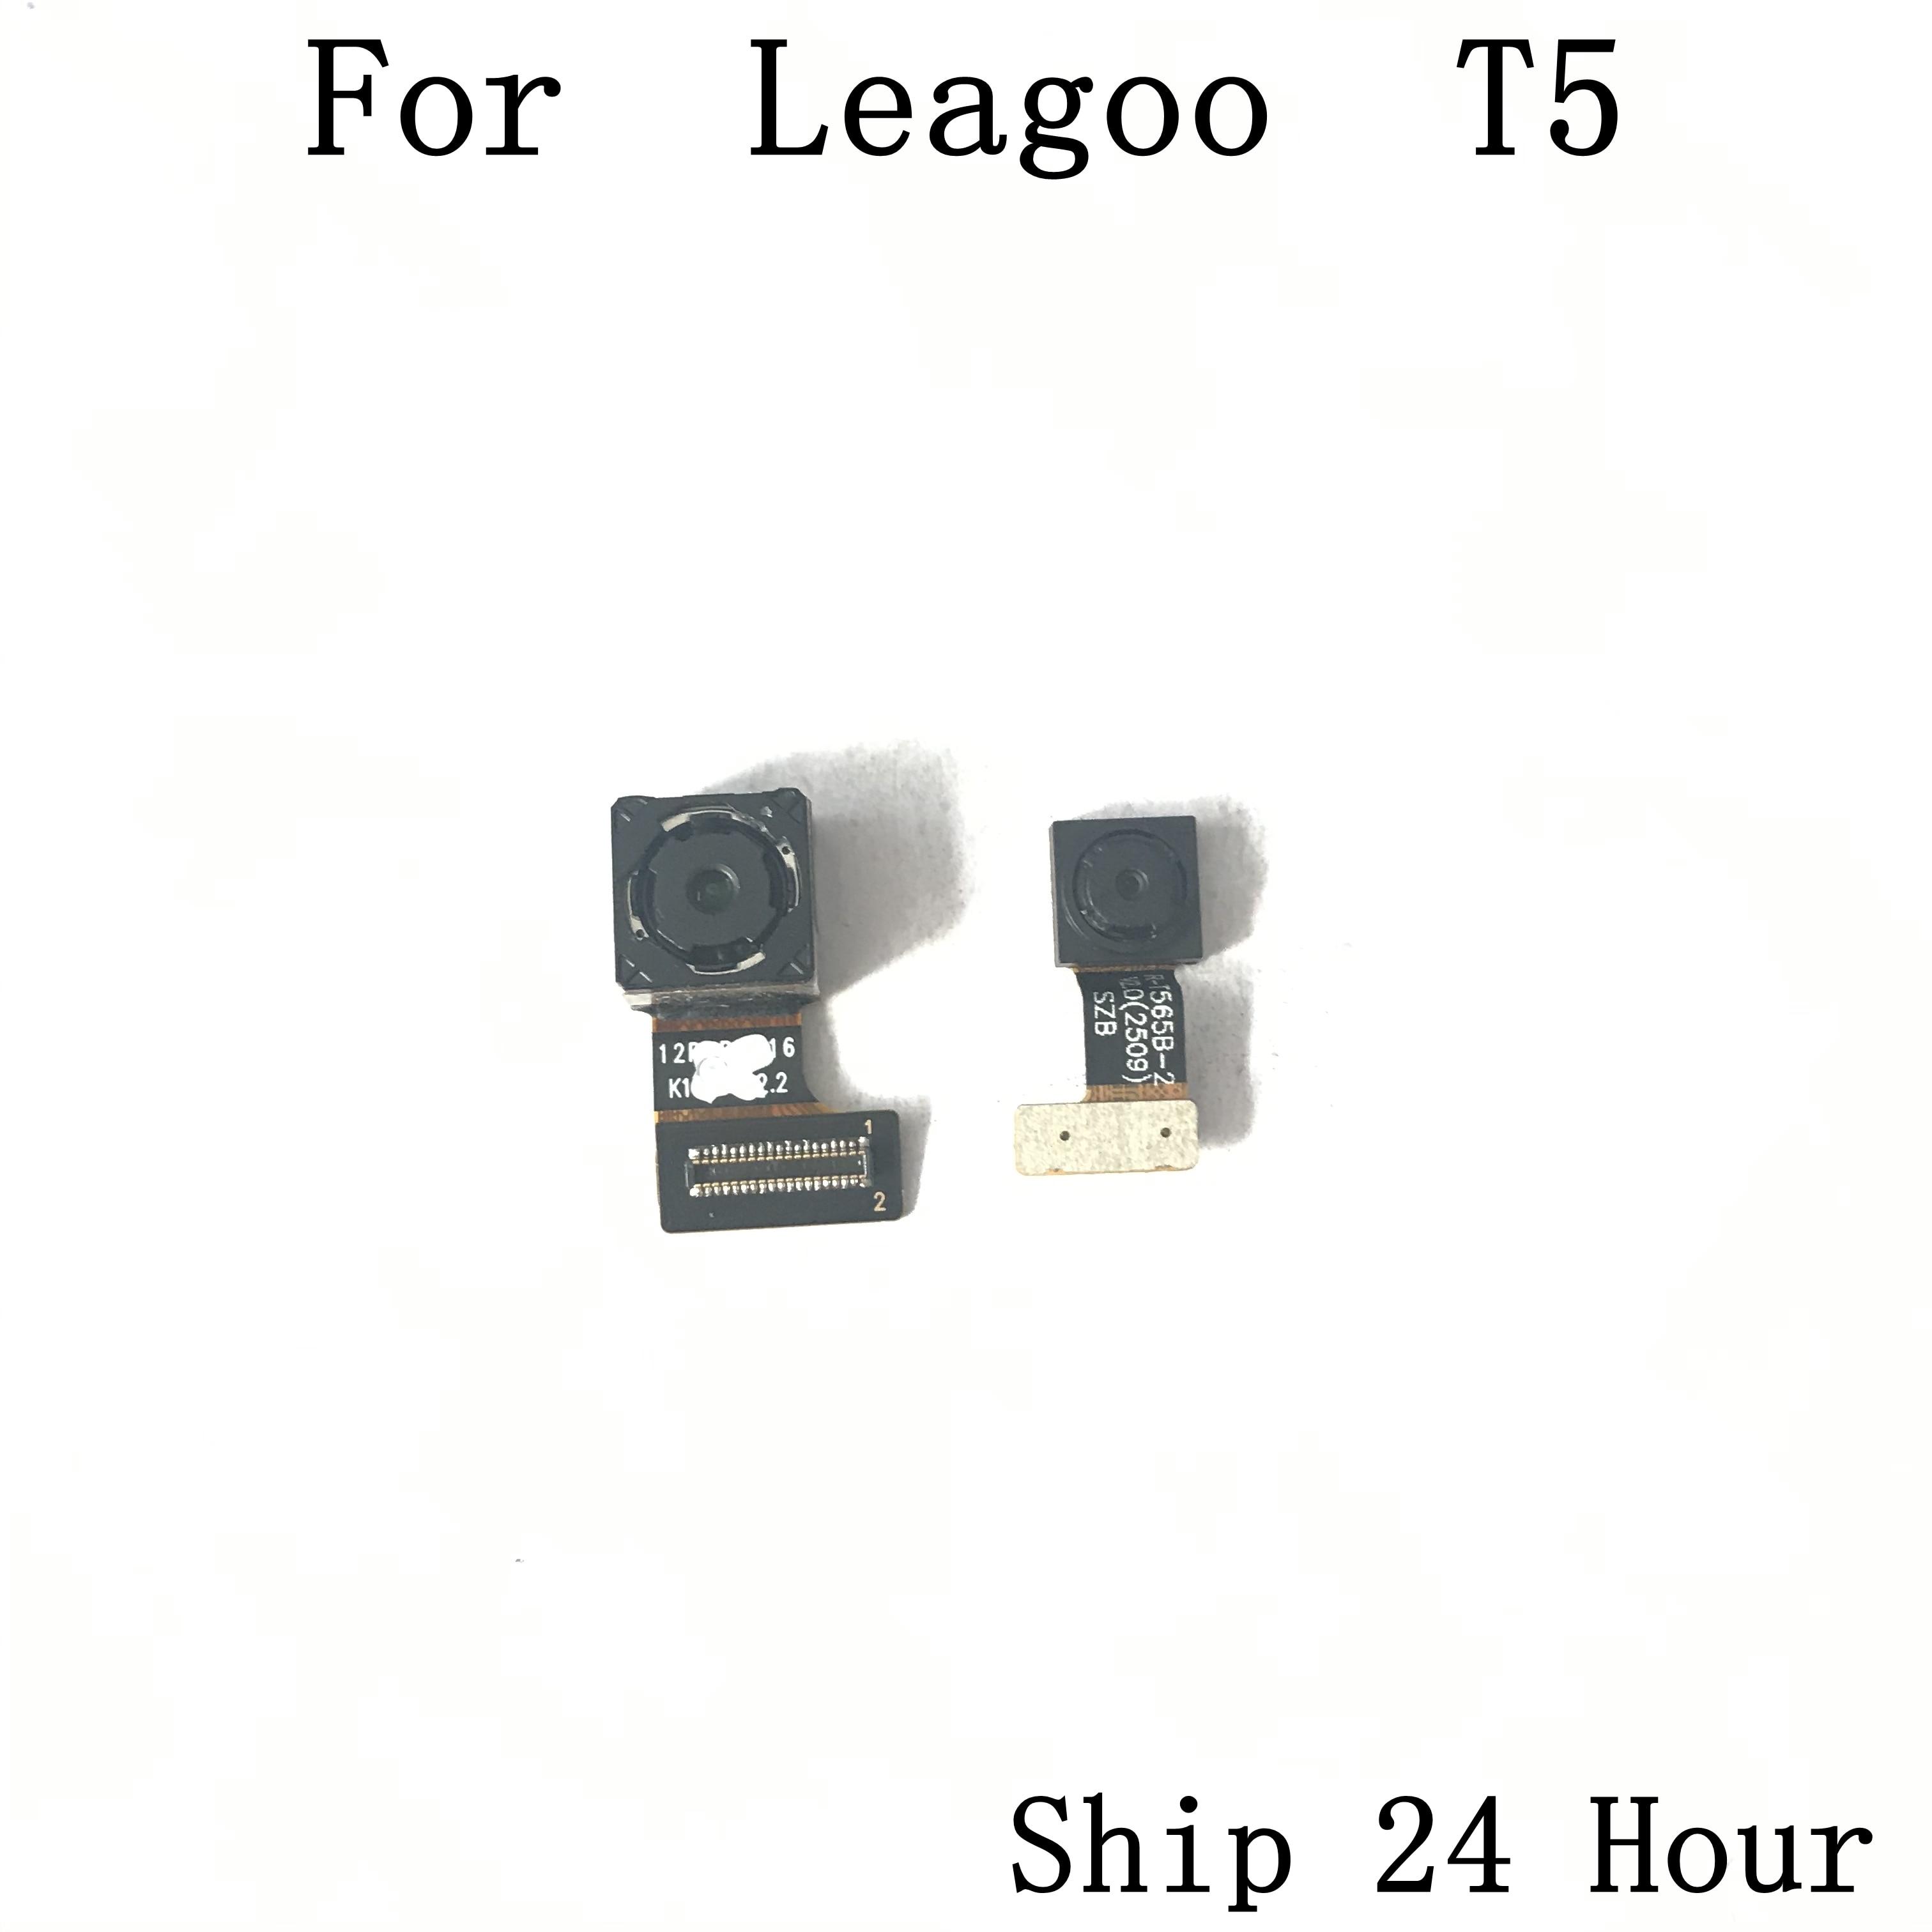 Leagoo T5 cámara trasera usada cámara trasera 13.0MP + 5.0MP módulo para Leagoo T5 reparación fijación pieza reemplazo envío gratis